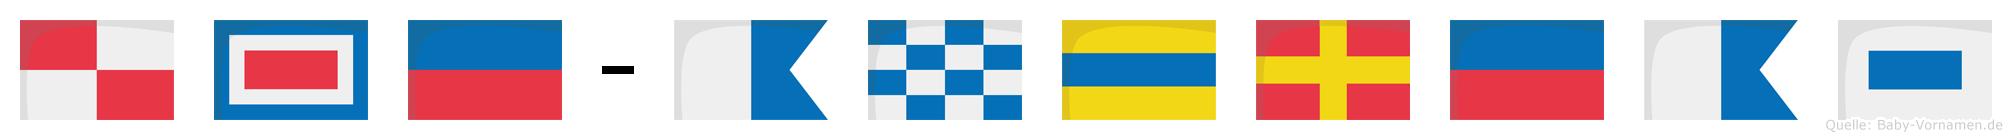 Uwe-Andreas im Flaggenalphabet